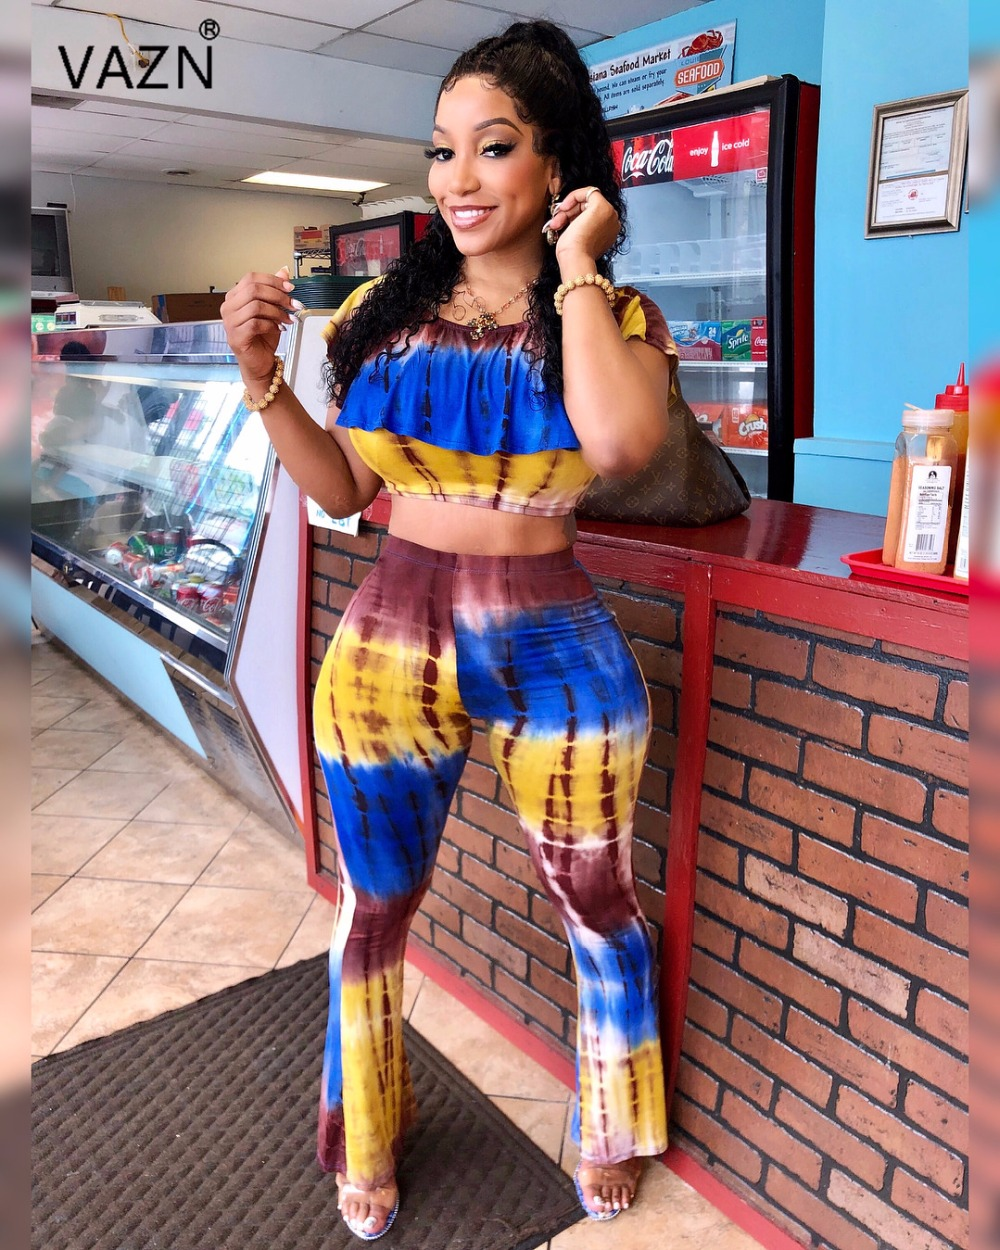 VAZN 2018 hot summer 2-pieces print long jumpsuits women short sleeve o-neck jumpsuits ladies hollow out jumpsuits LS6136